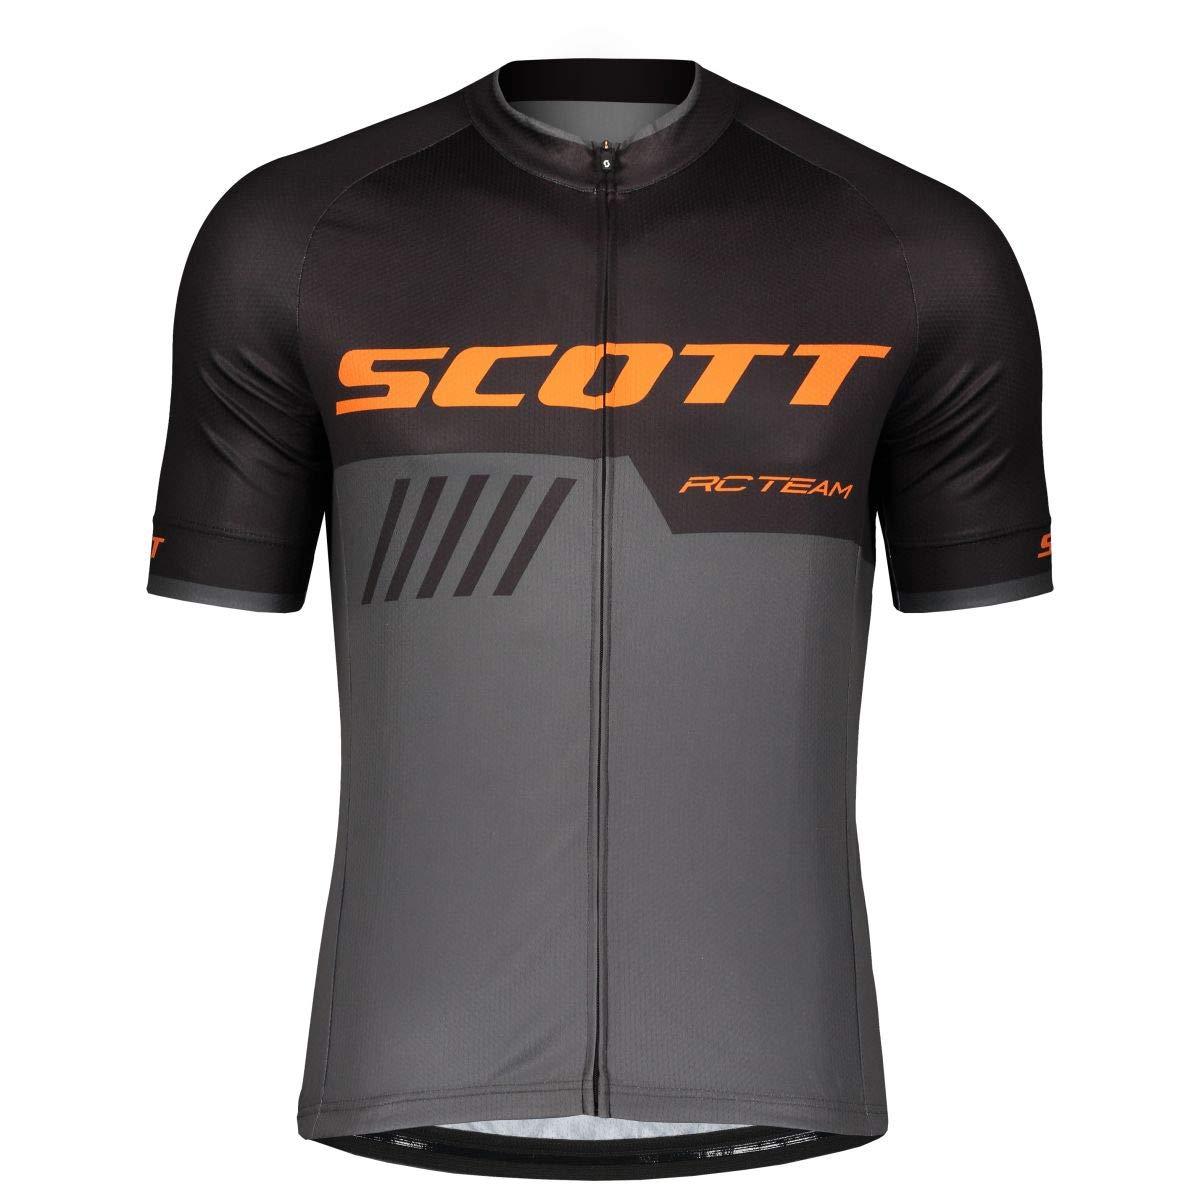 Scott RC Team 10 Fahrrad Trikot kurz grau/schwarz 2019